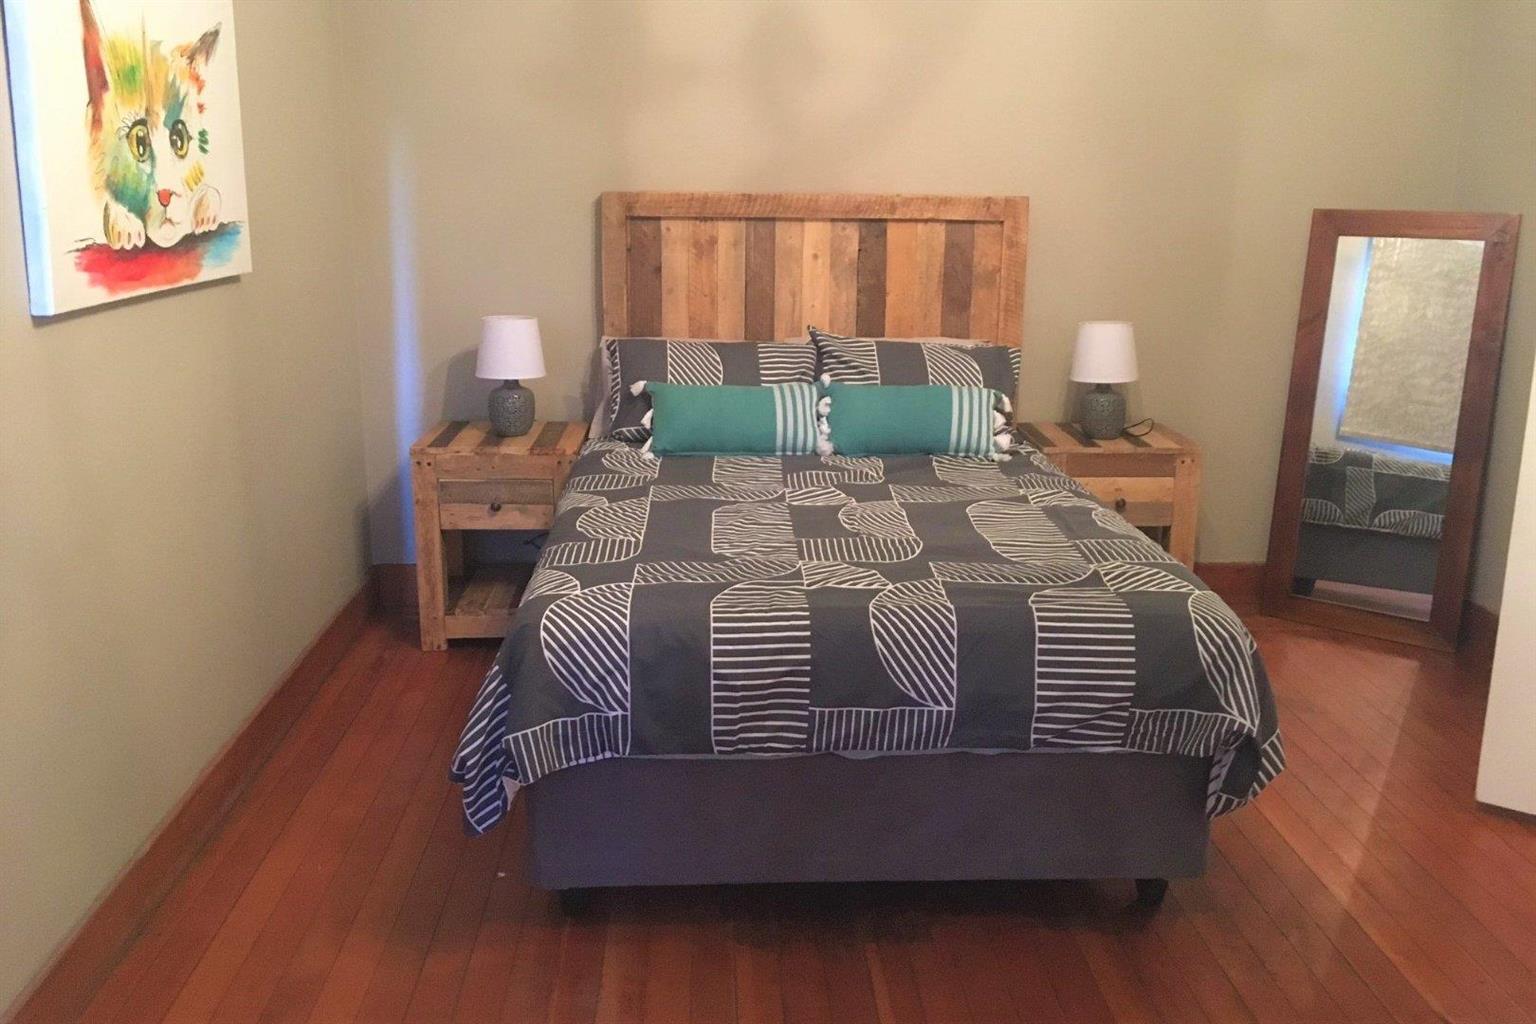 Apartment Rental Monthly in Alexandra